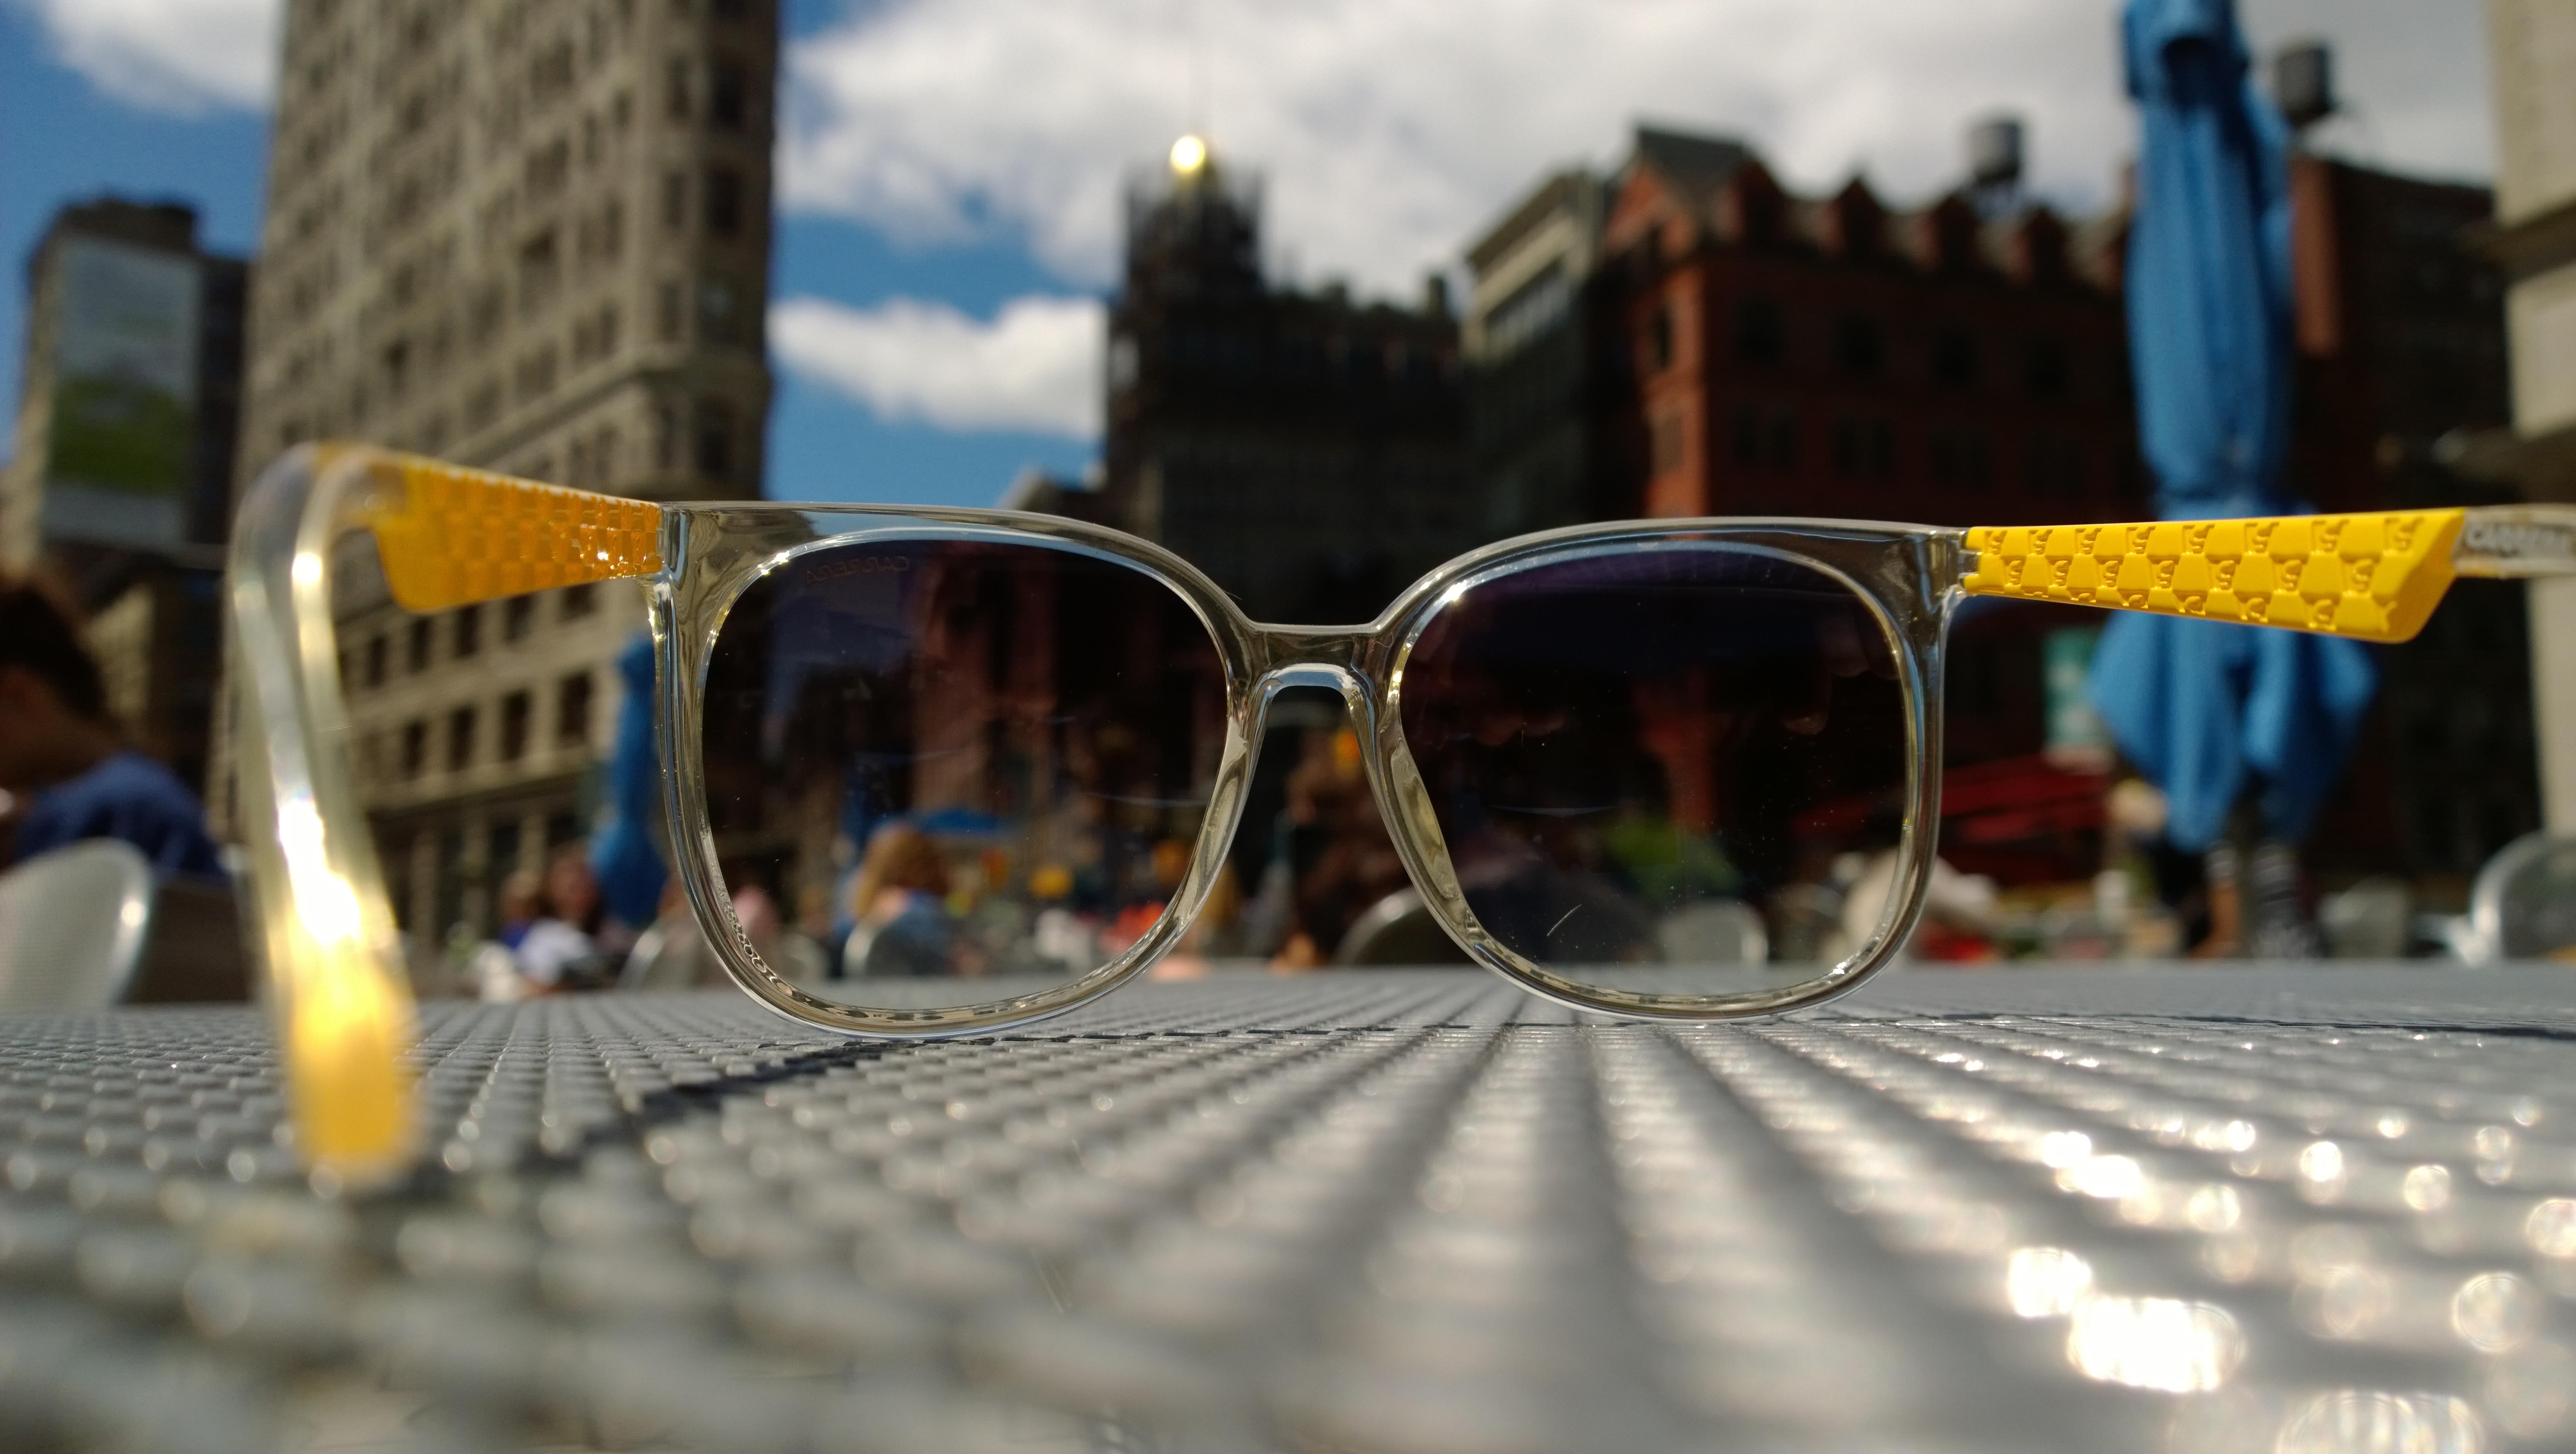 define social reform photography DyE